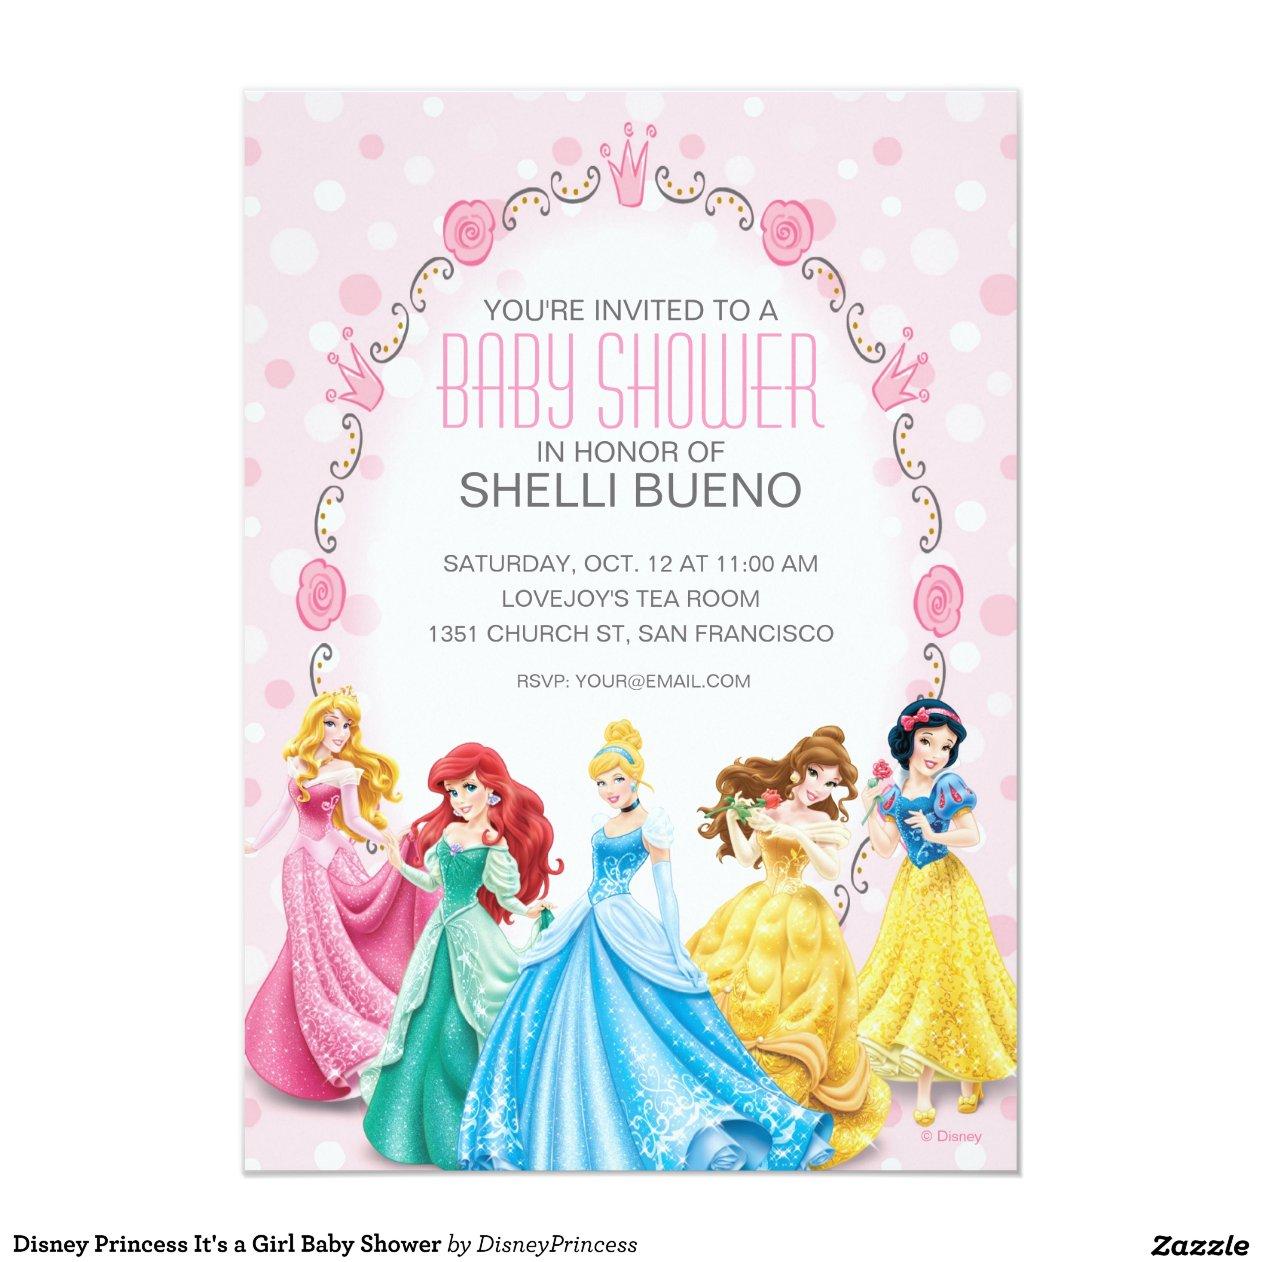 Disney Princess It's a Girl Baby Shower 5x7 Paper Invitation Card | Zazzle